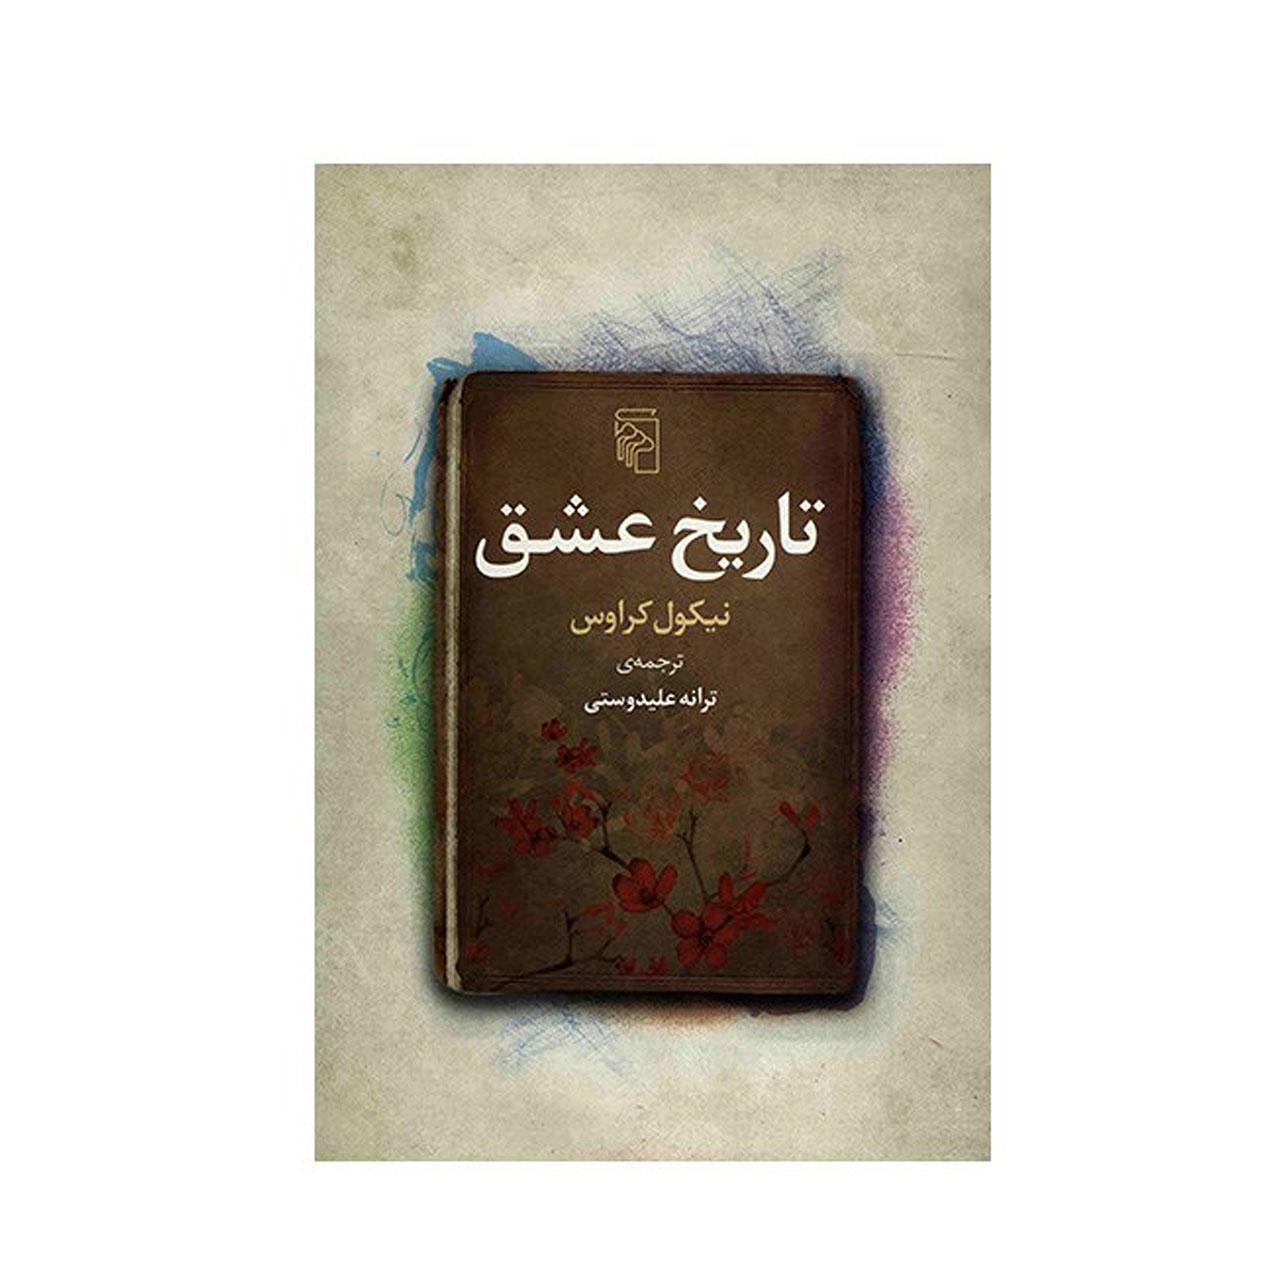 کتاب تاریخ عشق اثر نیکول کراوس